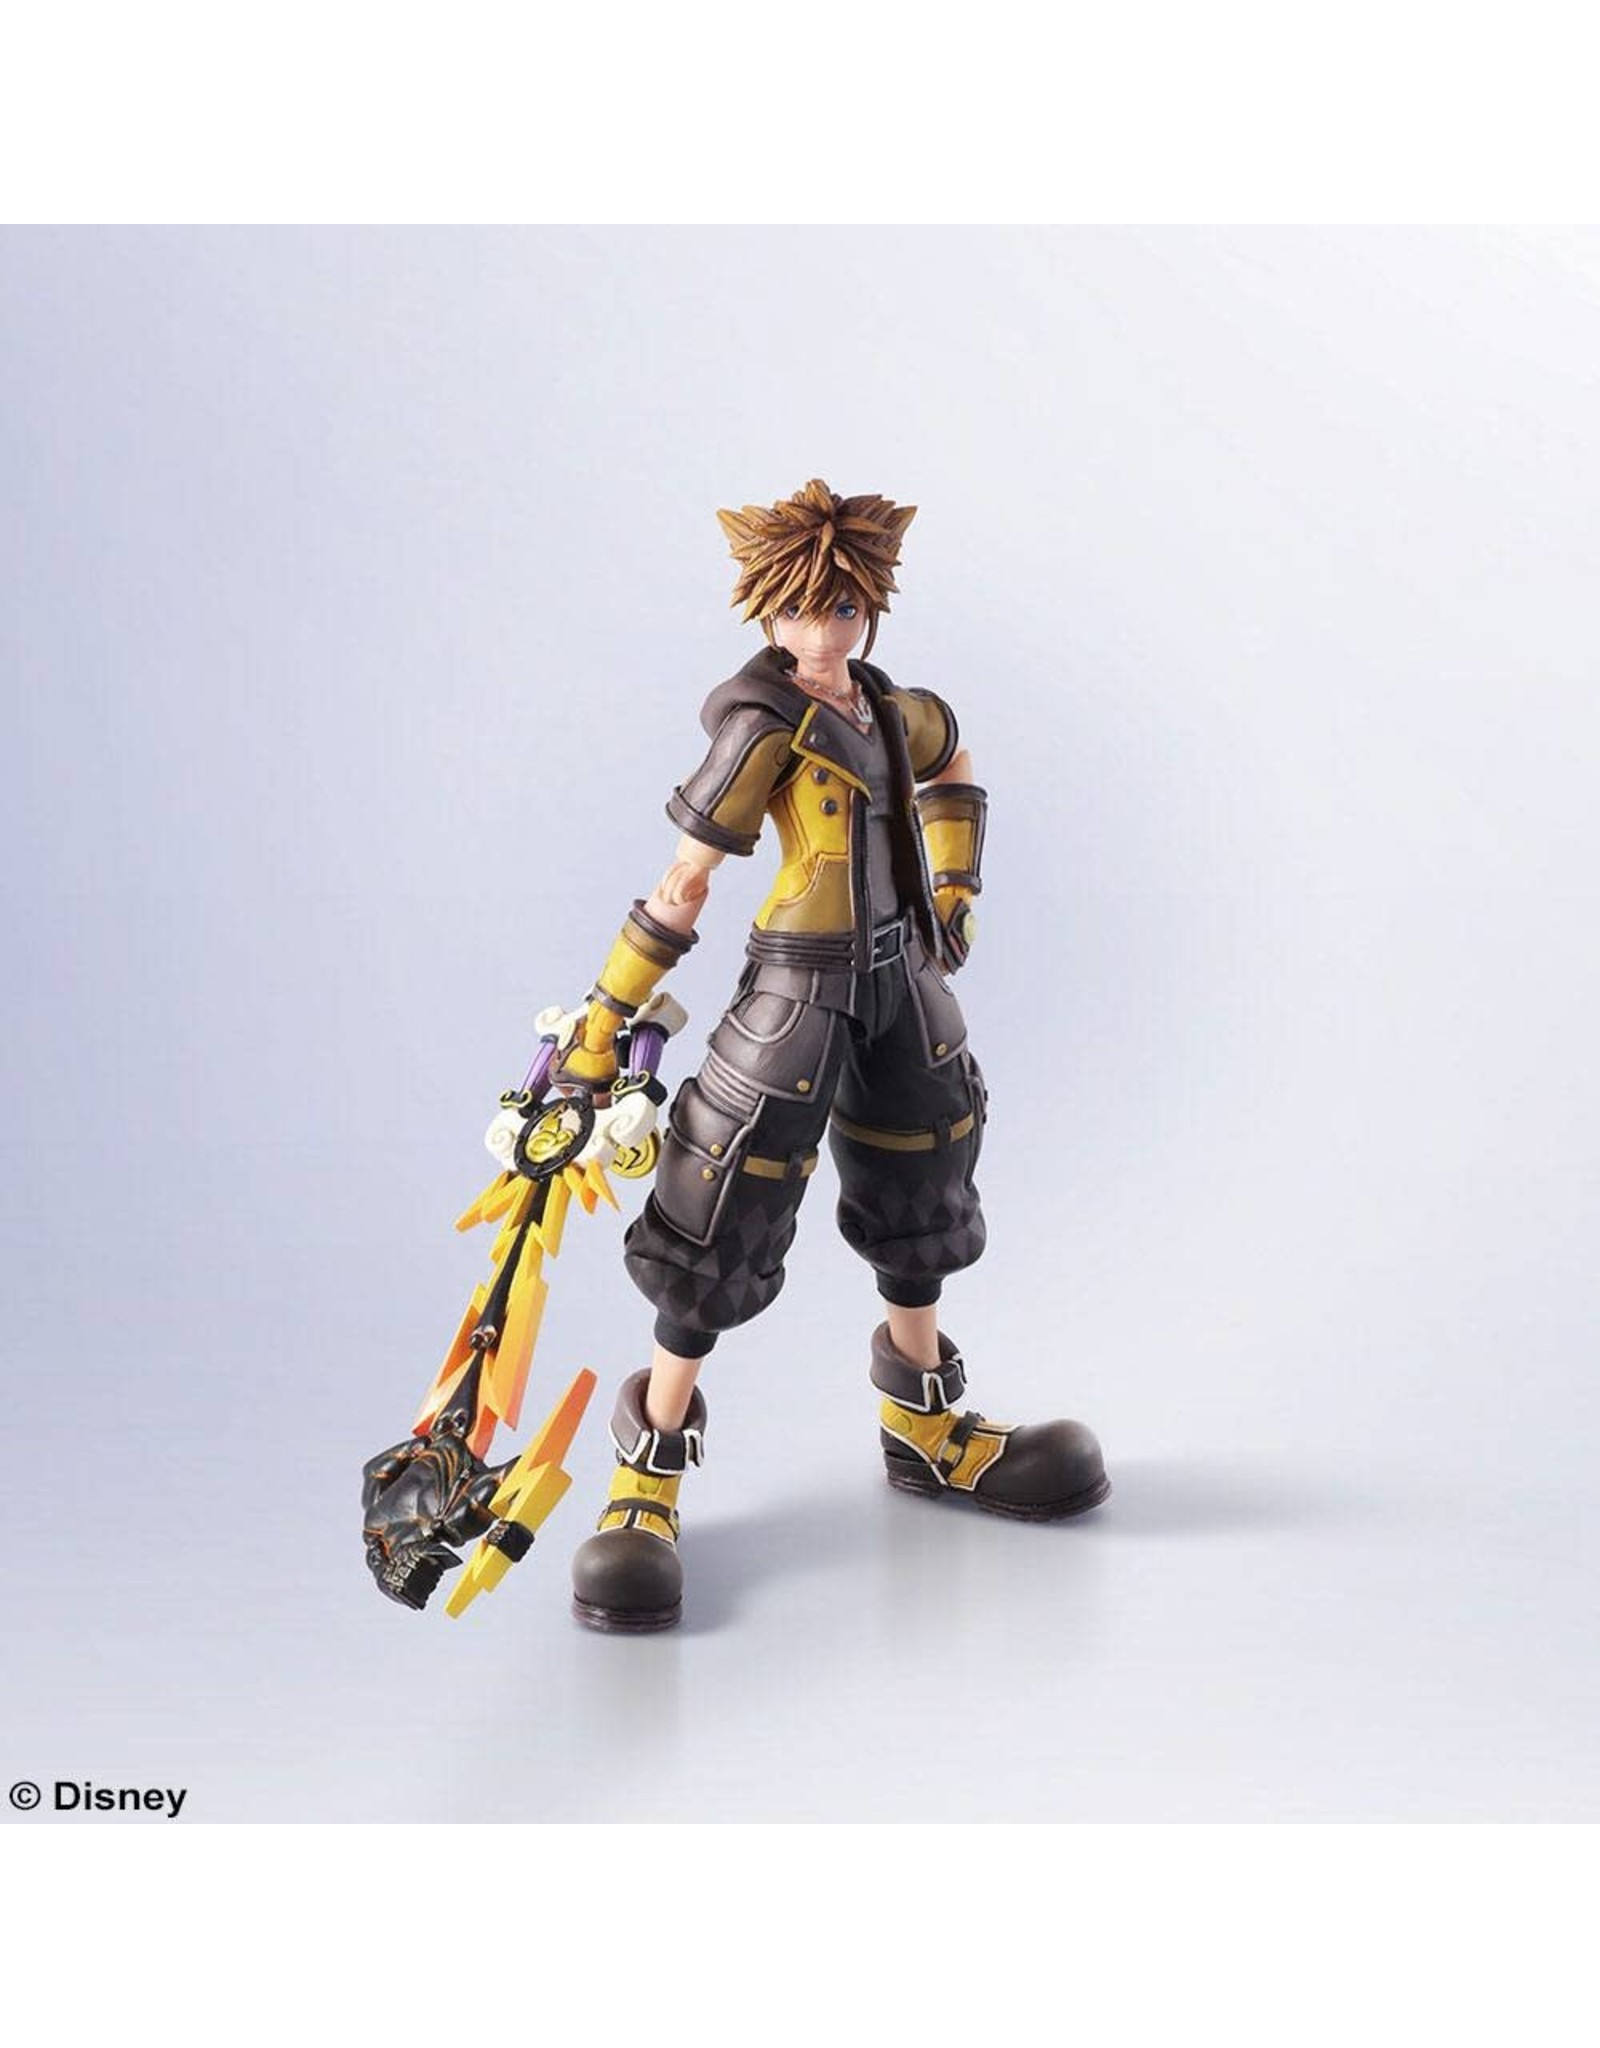 Kingdom Hearts III - Sora - Bring Arts Action Figure Sora Guardian Form Version - 16cm